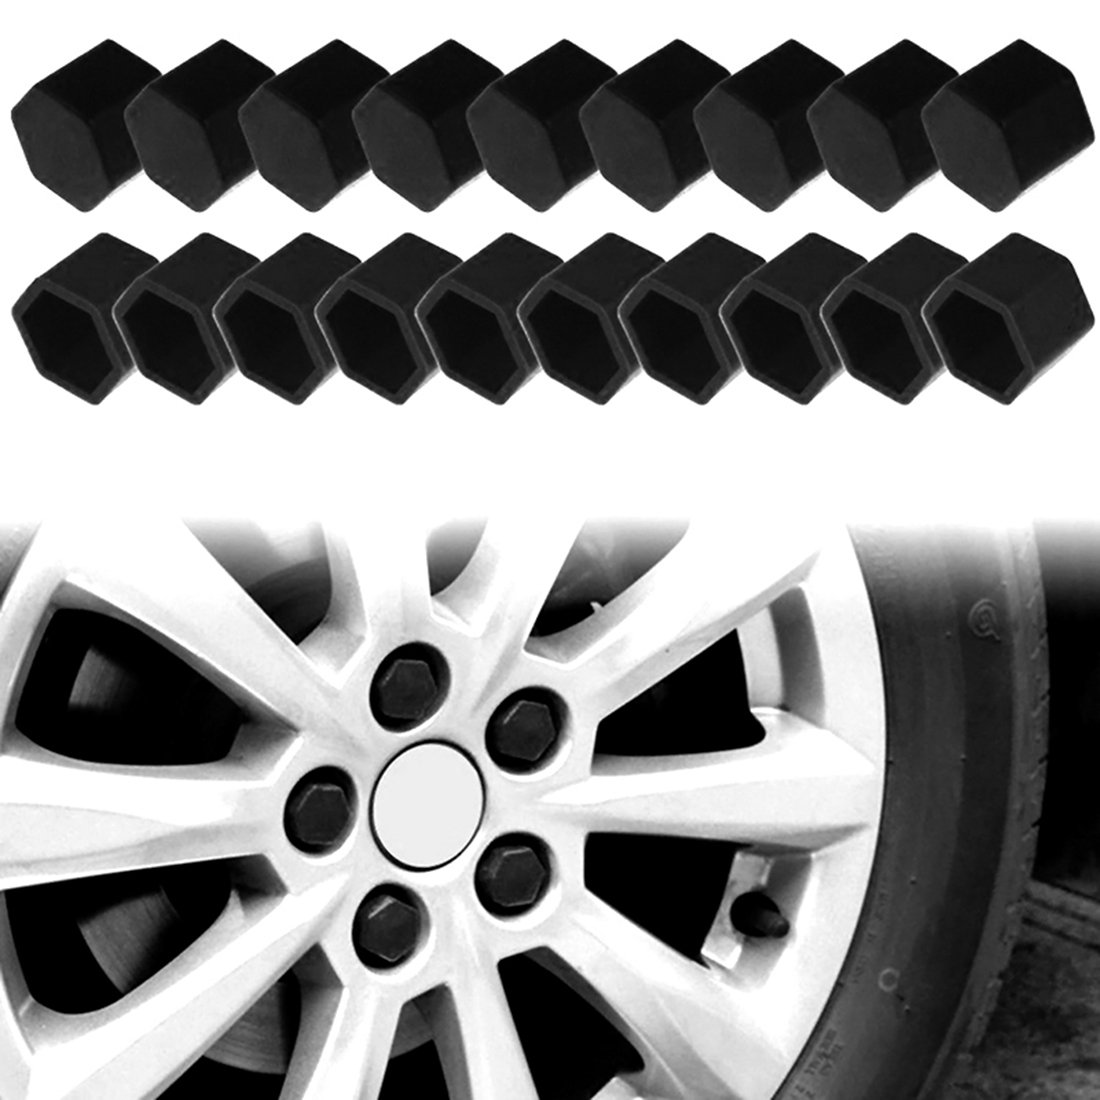 X AUTOHAUX 20pcs 17mm Universal Blue Silicone Car Wheel Nut Lug Hub Screw Rim Bolt Covers Dust Protection Tyres Screw Caps